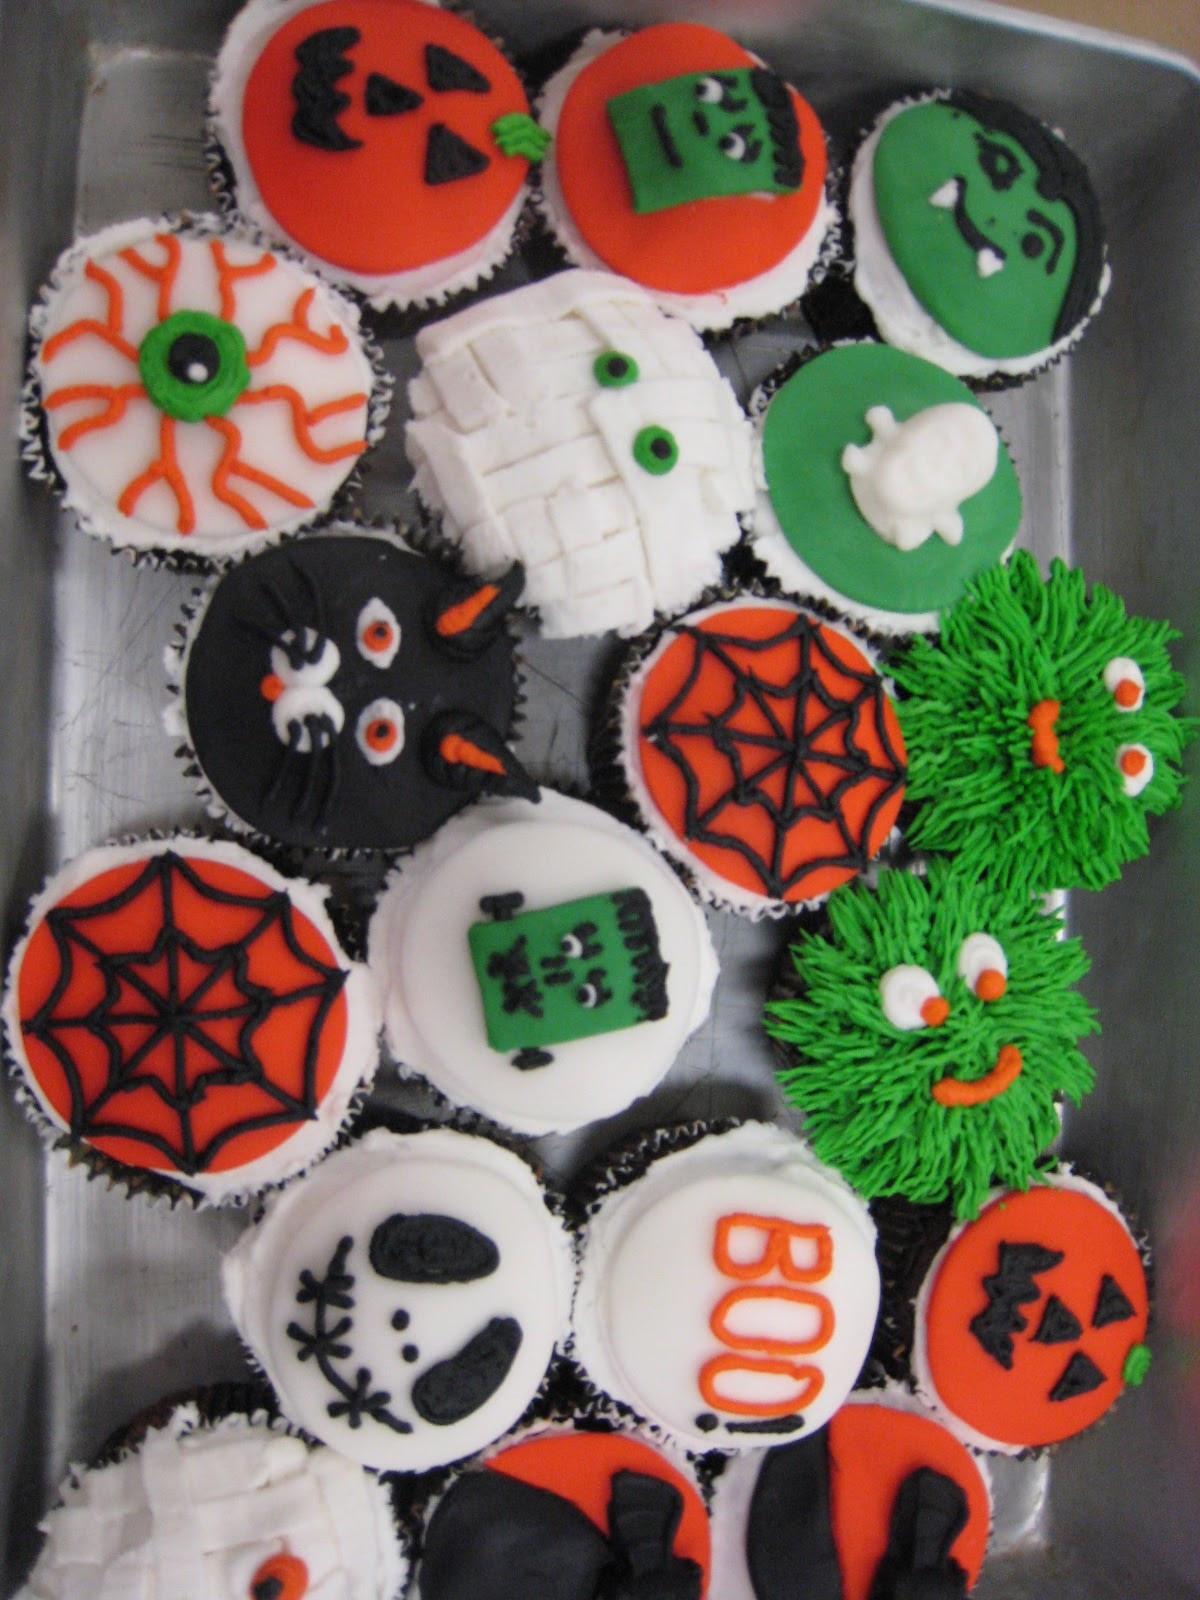 Halloween Cupcakes Decorations  Judy Cakes Sugar Arts Halloween Cupcake Decorating Class